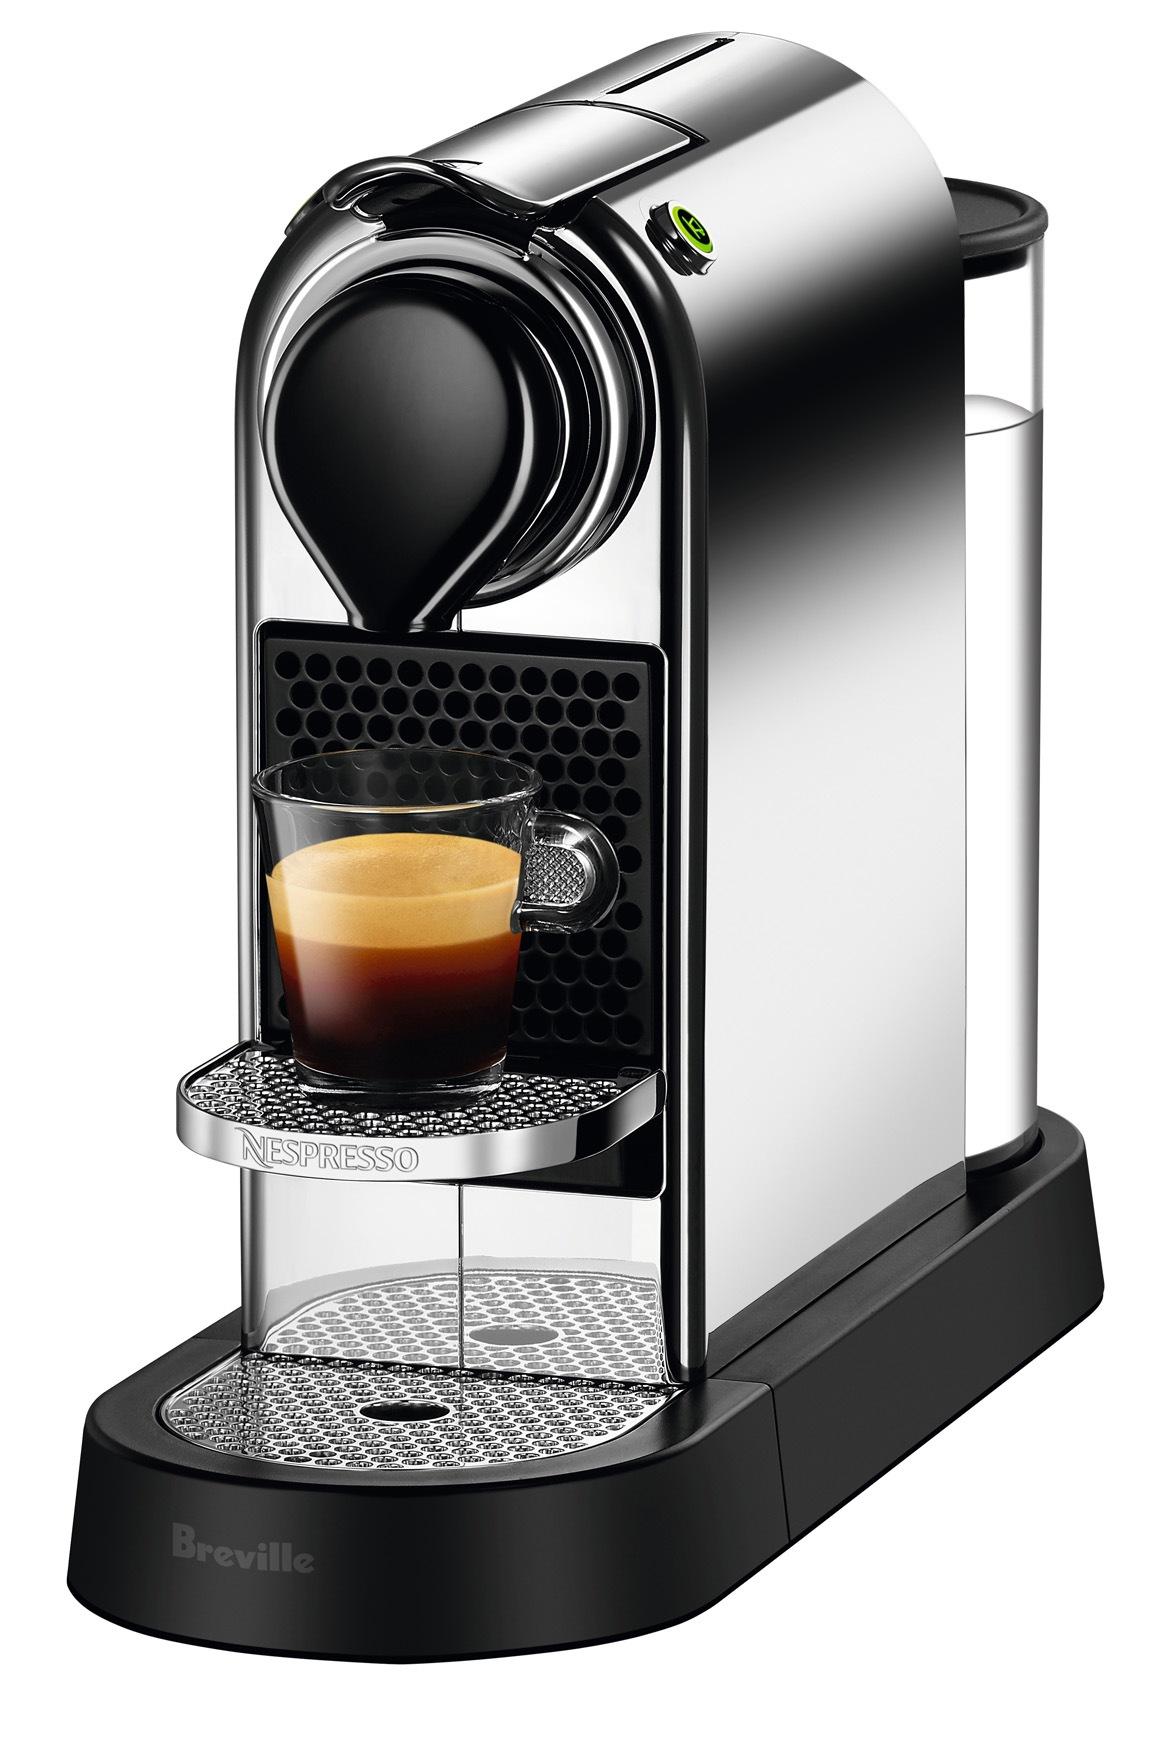 nespresso by breville bec650c citiz solo capsule coffee machine chrome myer online. Black Bedroom Furniture Sets. Home Design Ideas